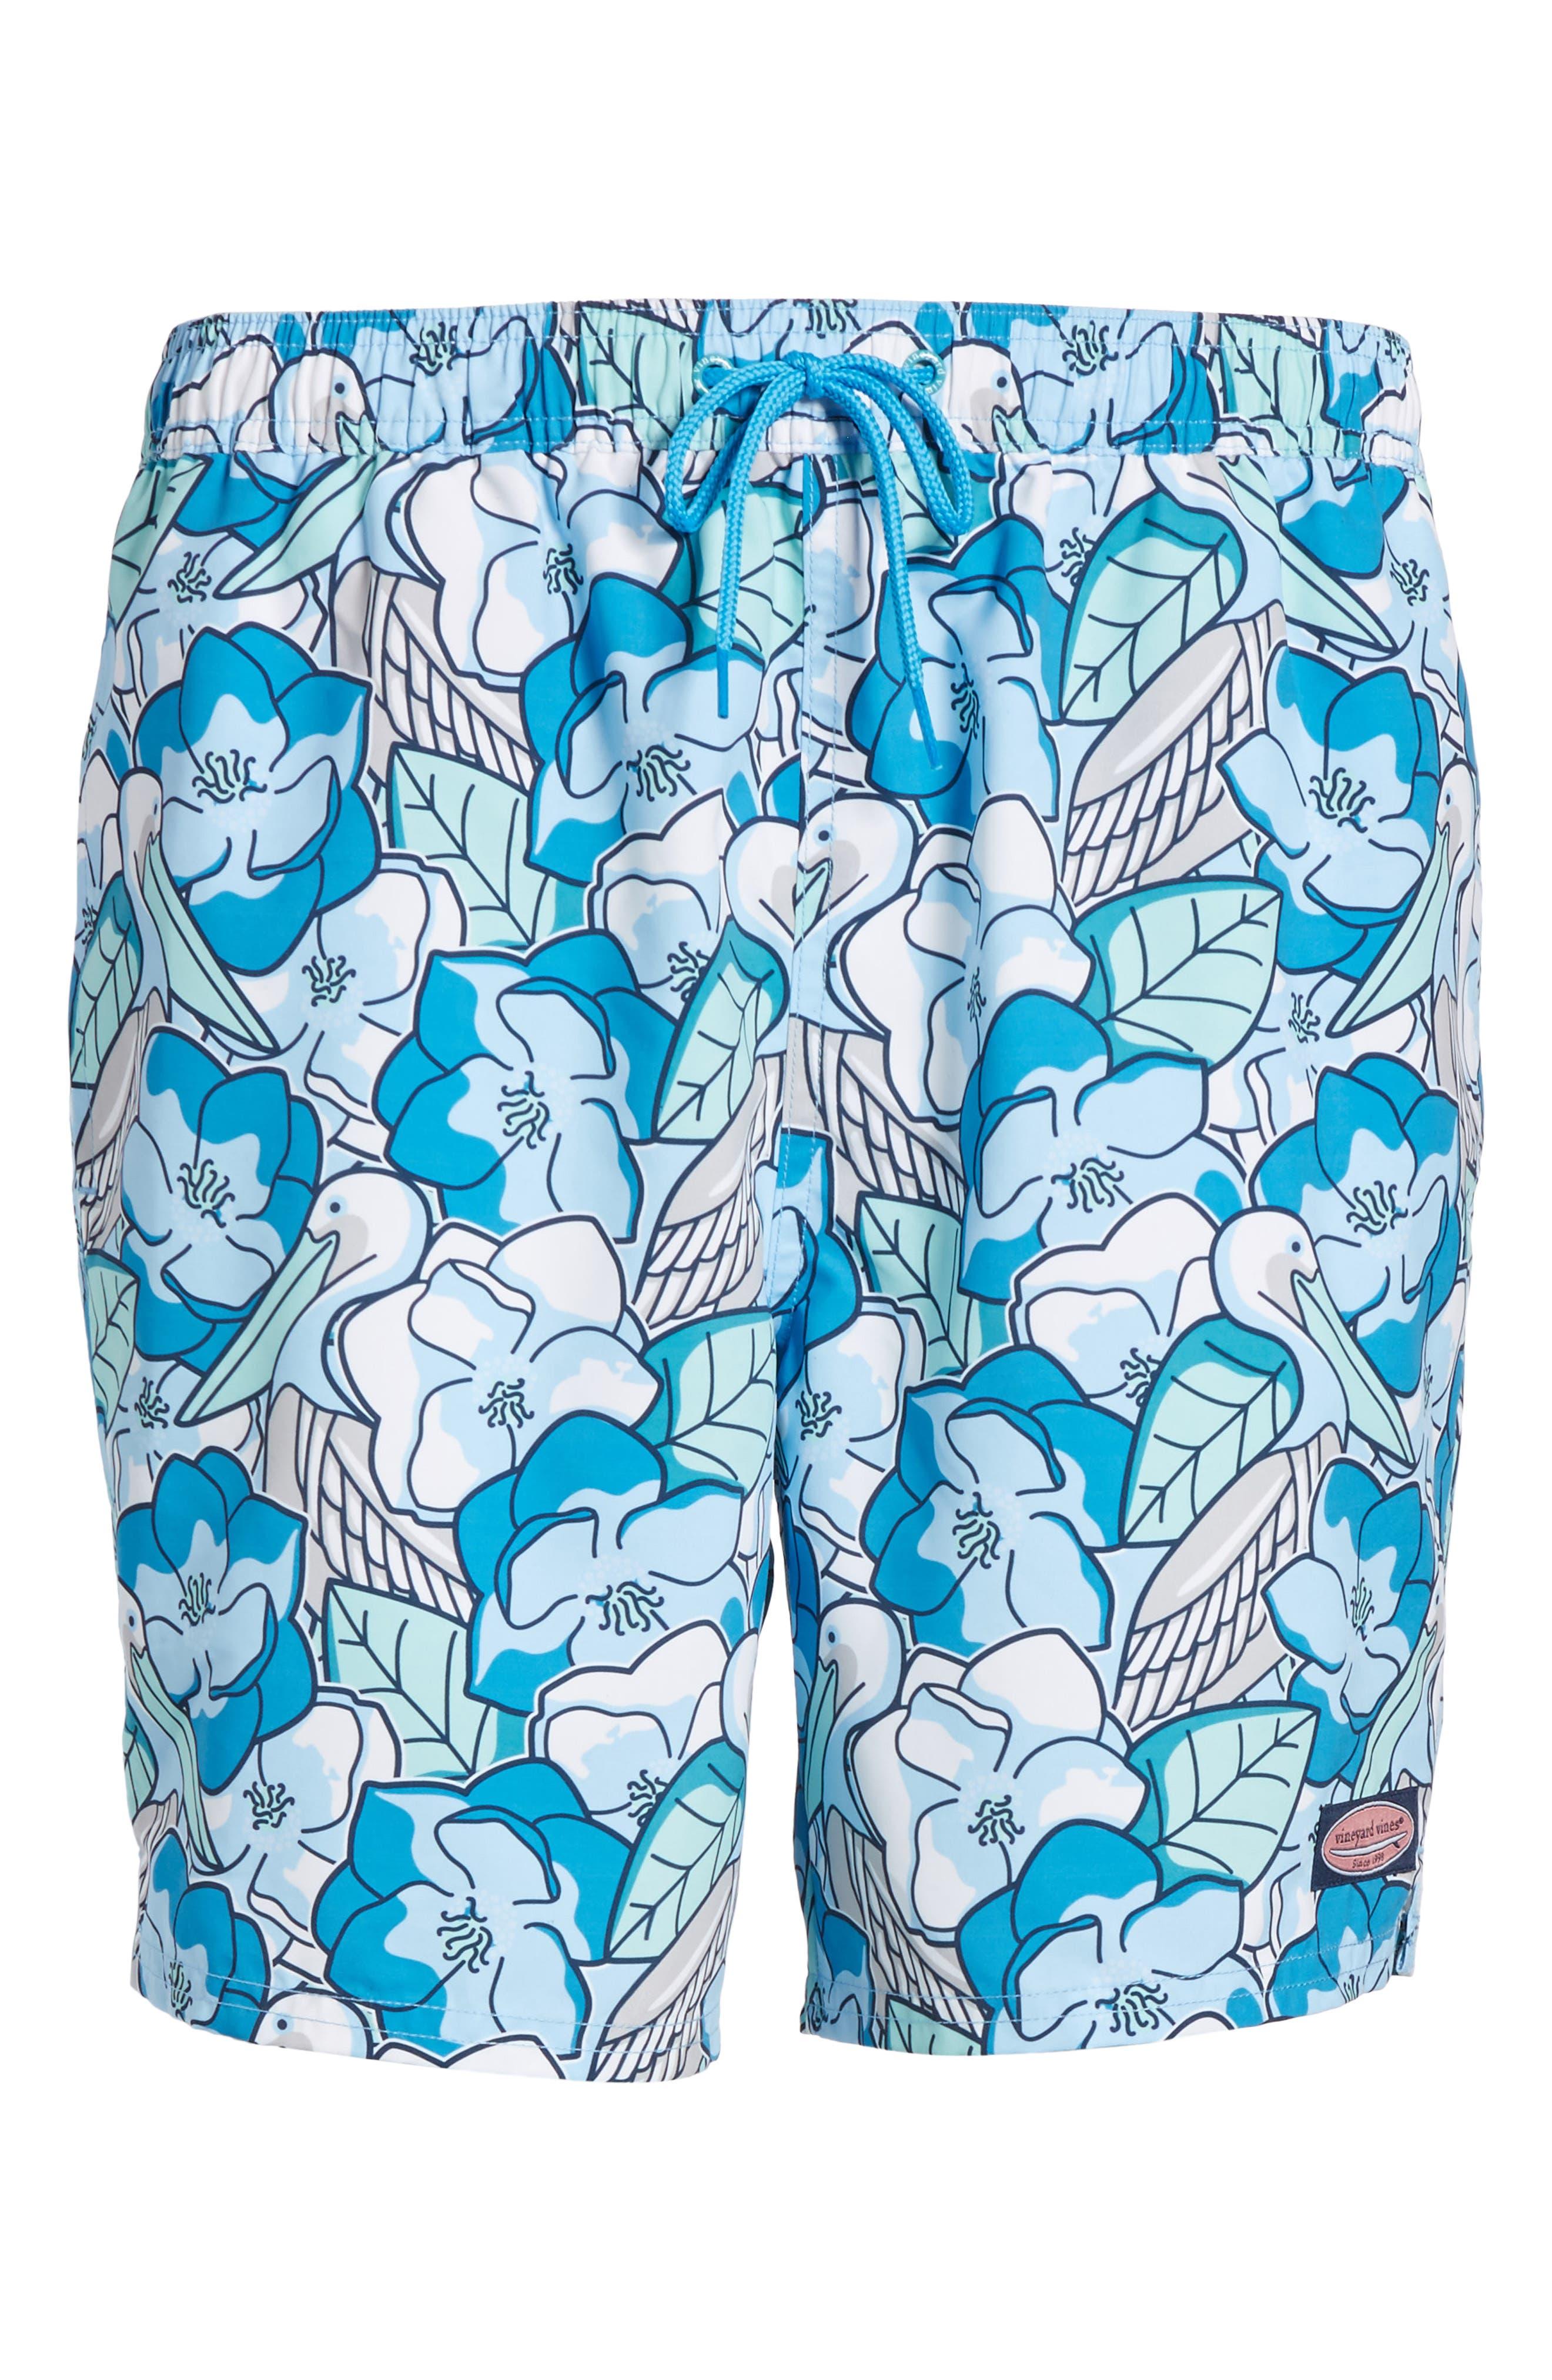 Pelican Magnolias Chappy Swim Trunks,                             Alternate thumbnail 6, color,                             Airy Blue